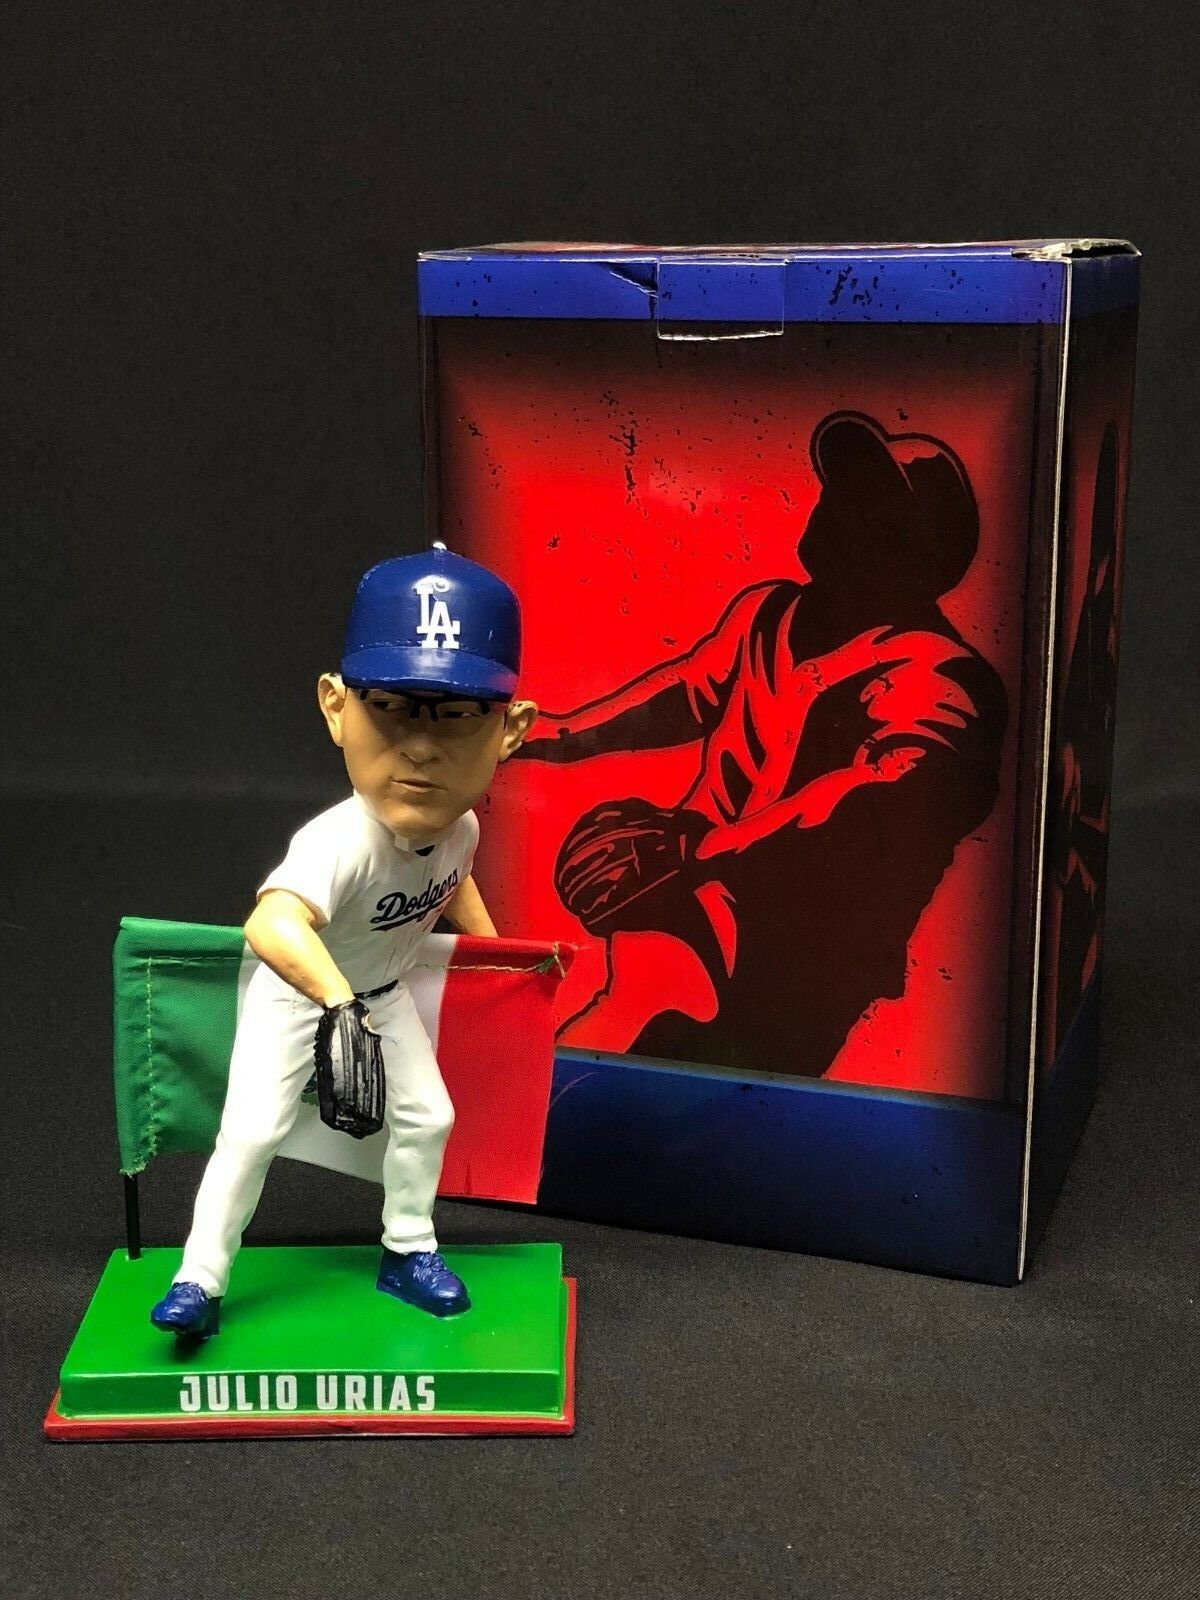 Julio Urias 2017 Forever Baseball Bobblehead MLB Licensed Limited *Viva Mexico